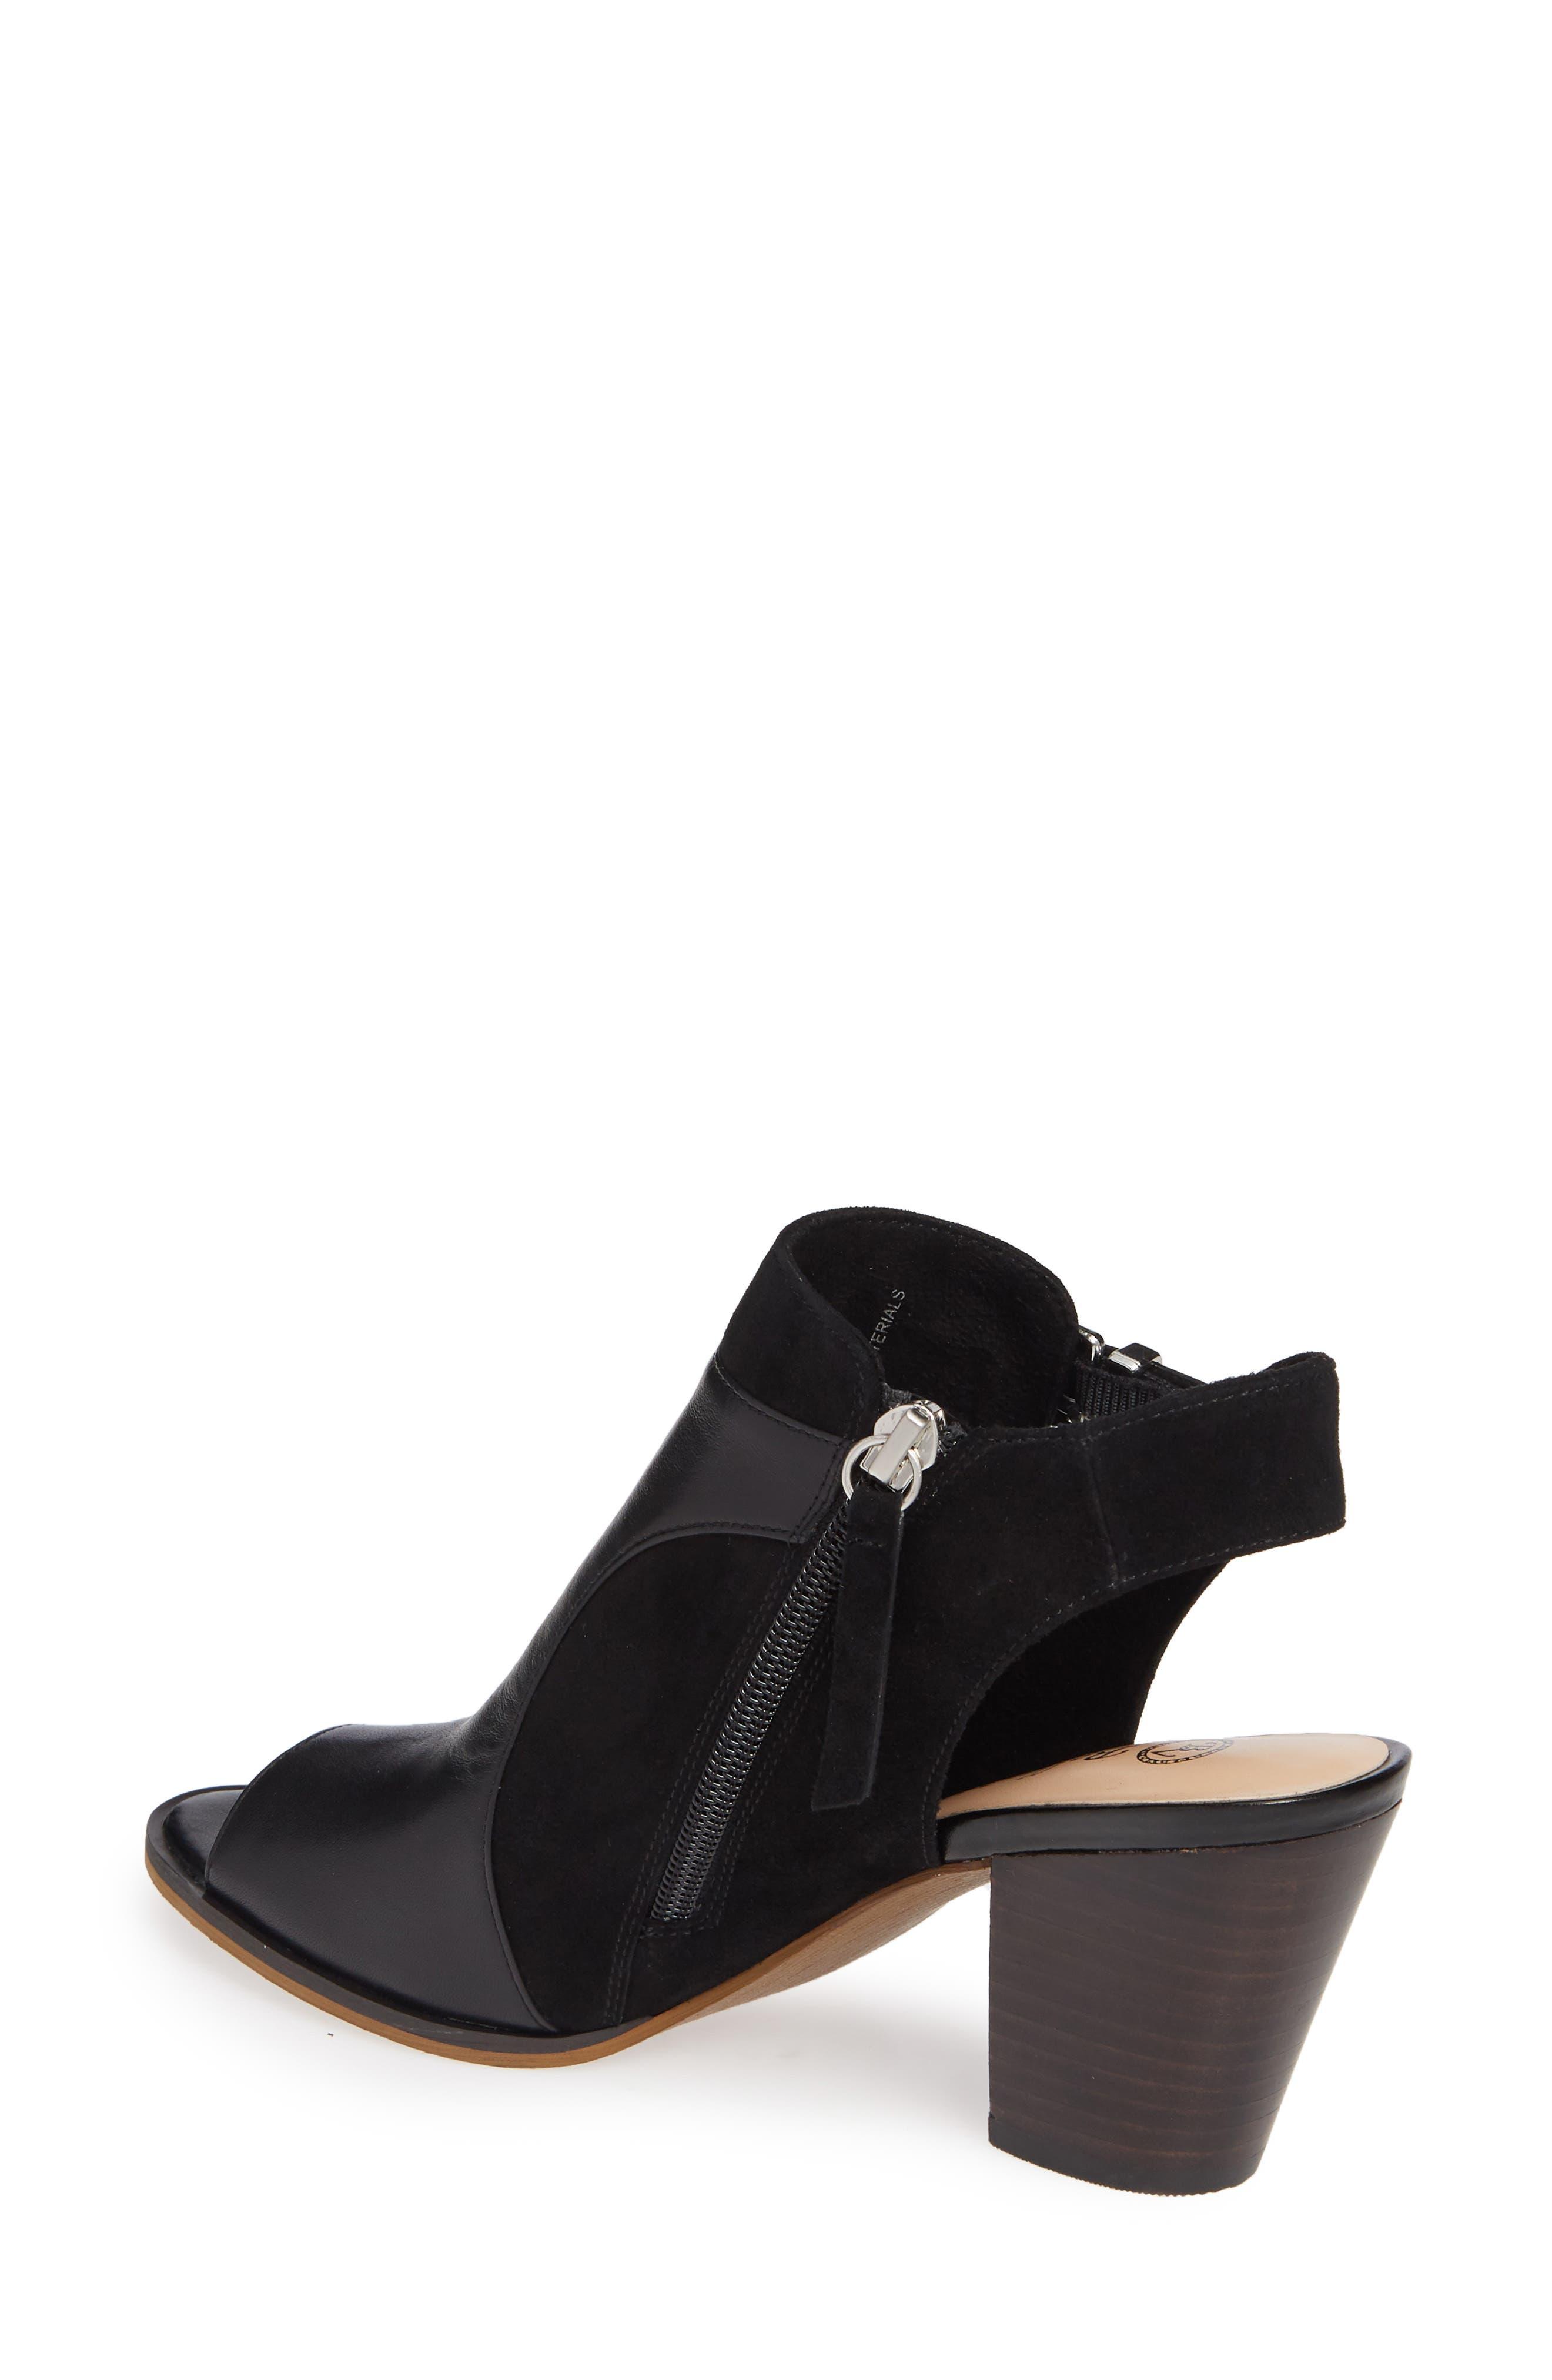 BELLA VITA, Kellan Mixed Finish Sandal, Alternate thumbnail 2, color, BLACK LEATHER/ SUEDE